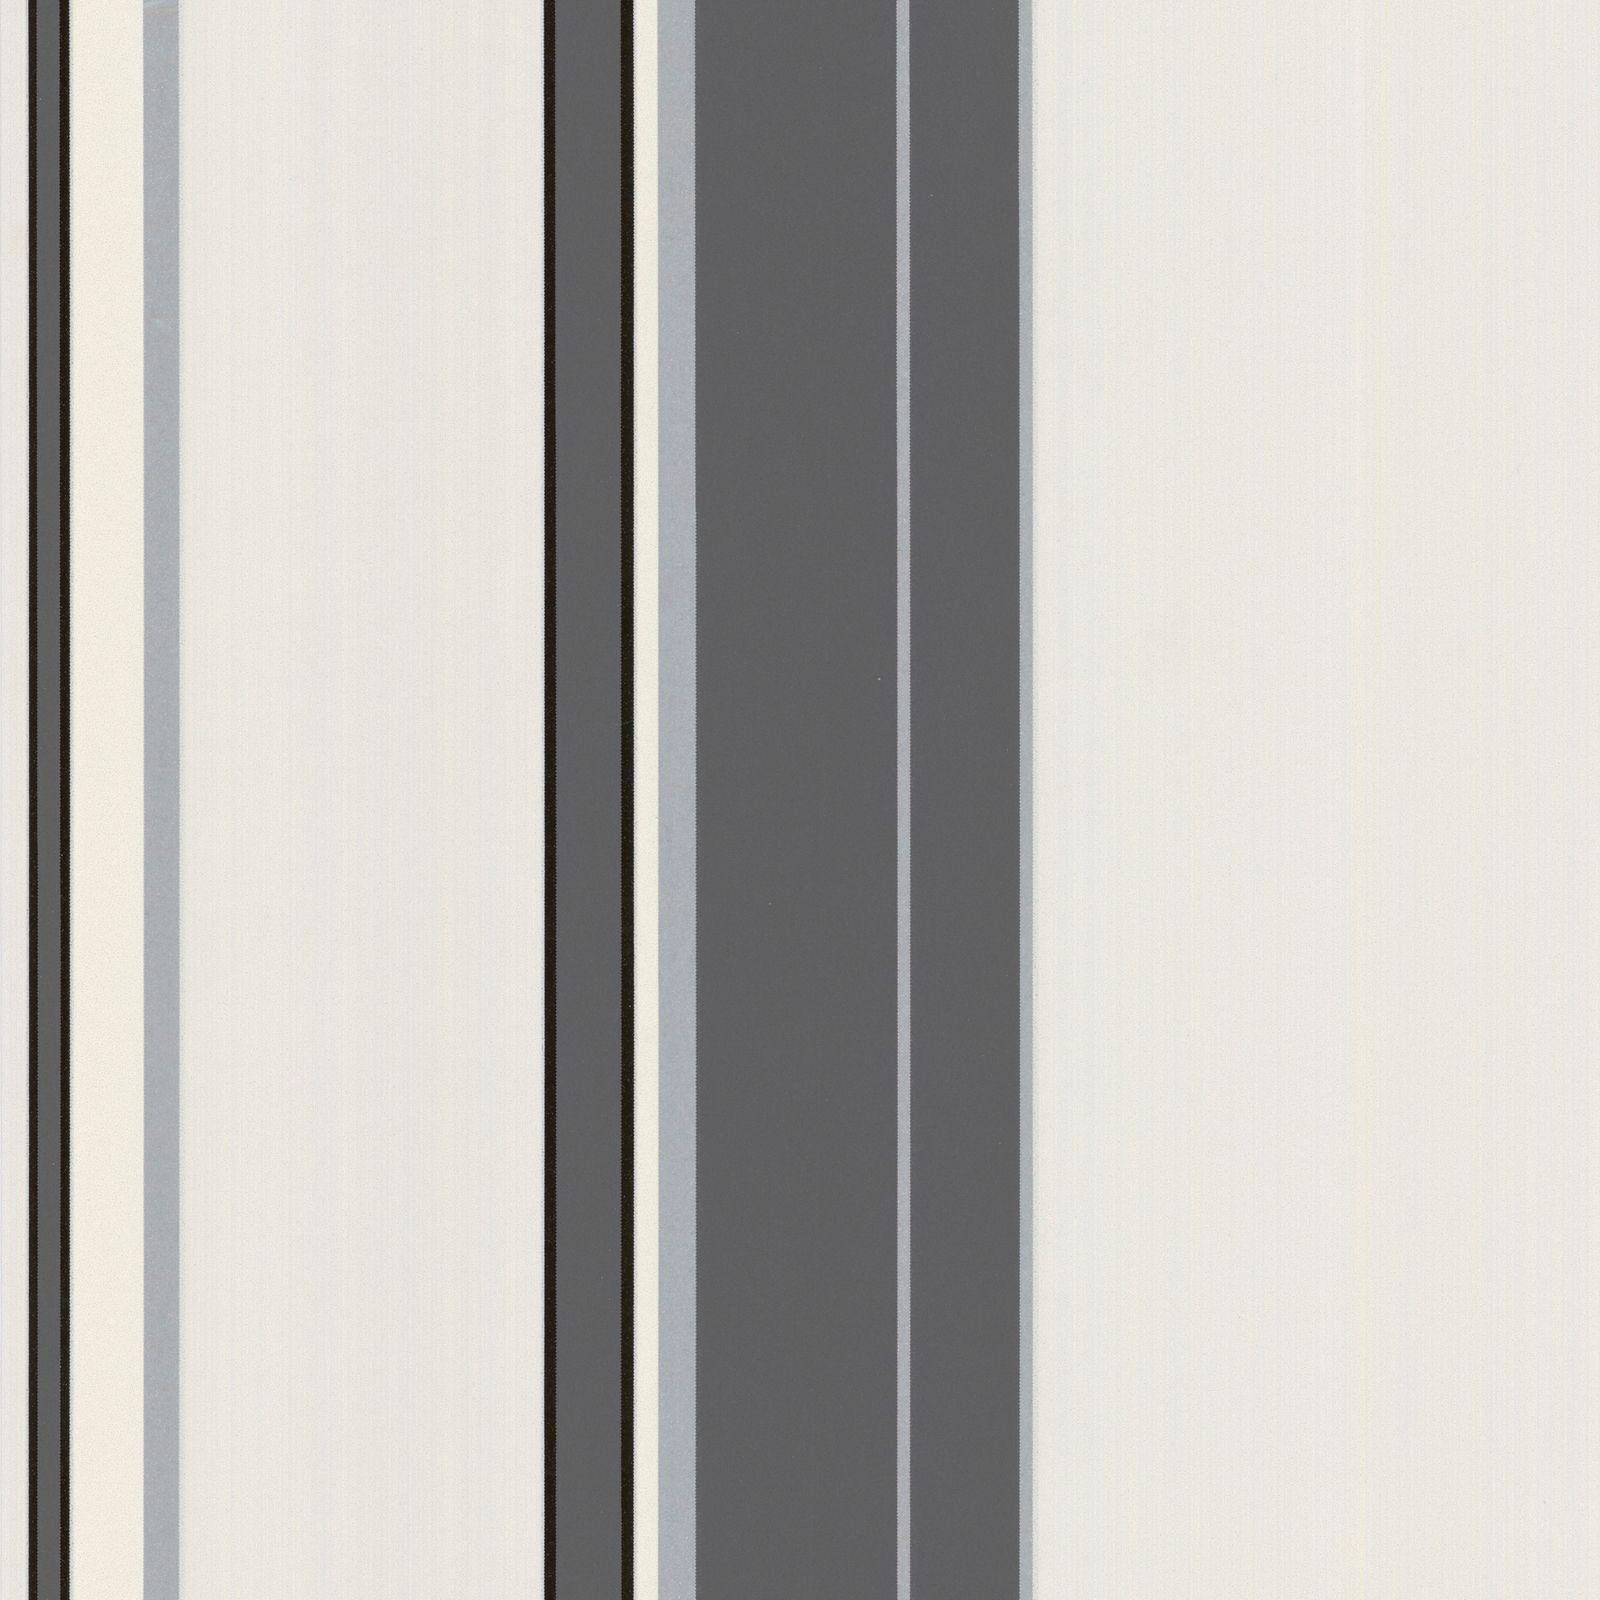 superfresco grey striped 1600x1600 wallpaper teahub io teahub io